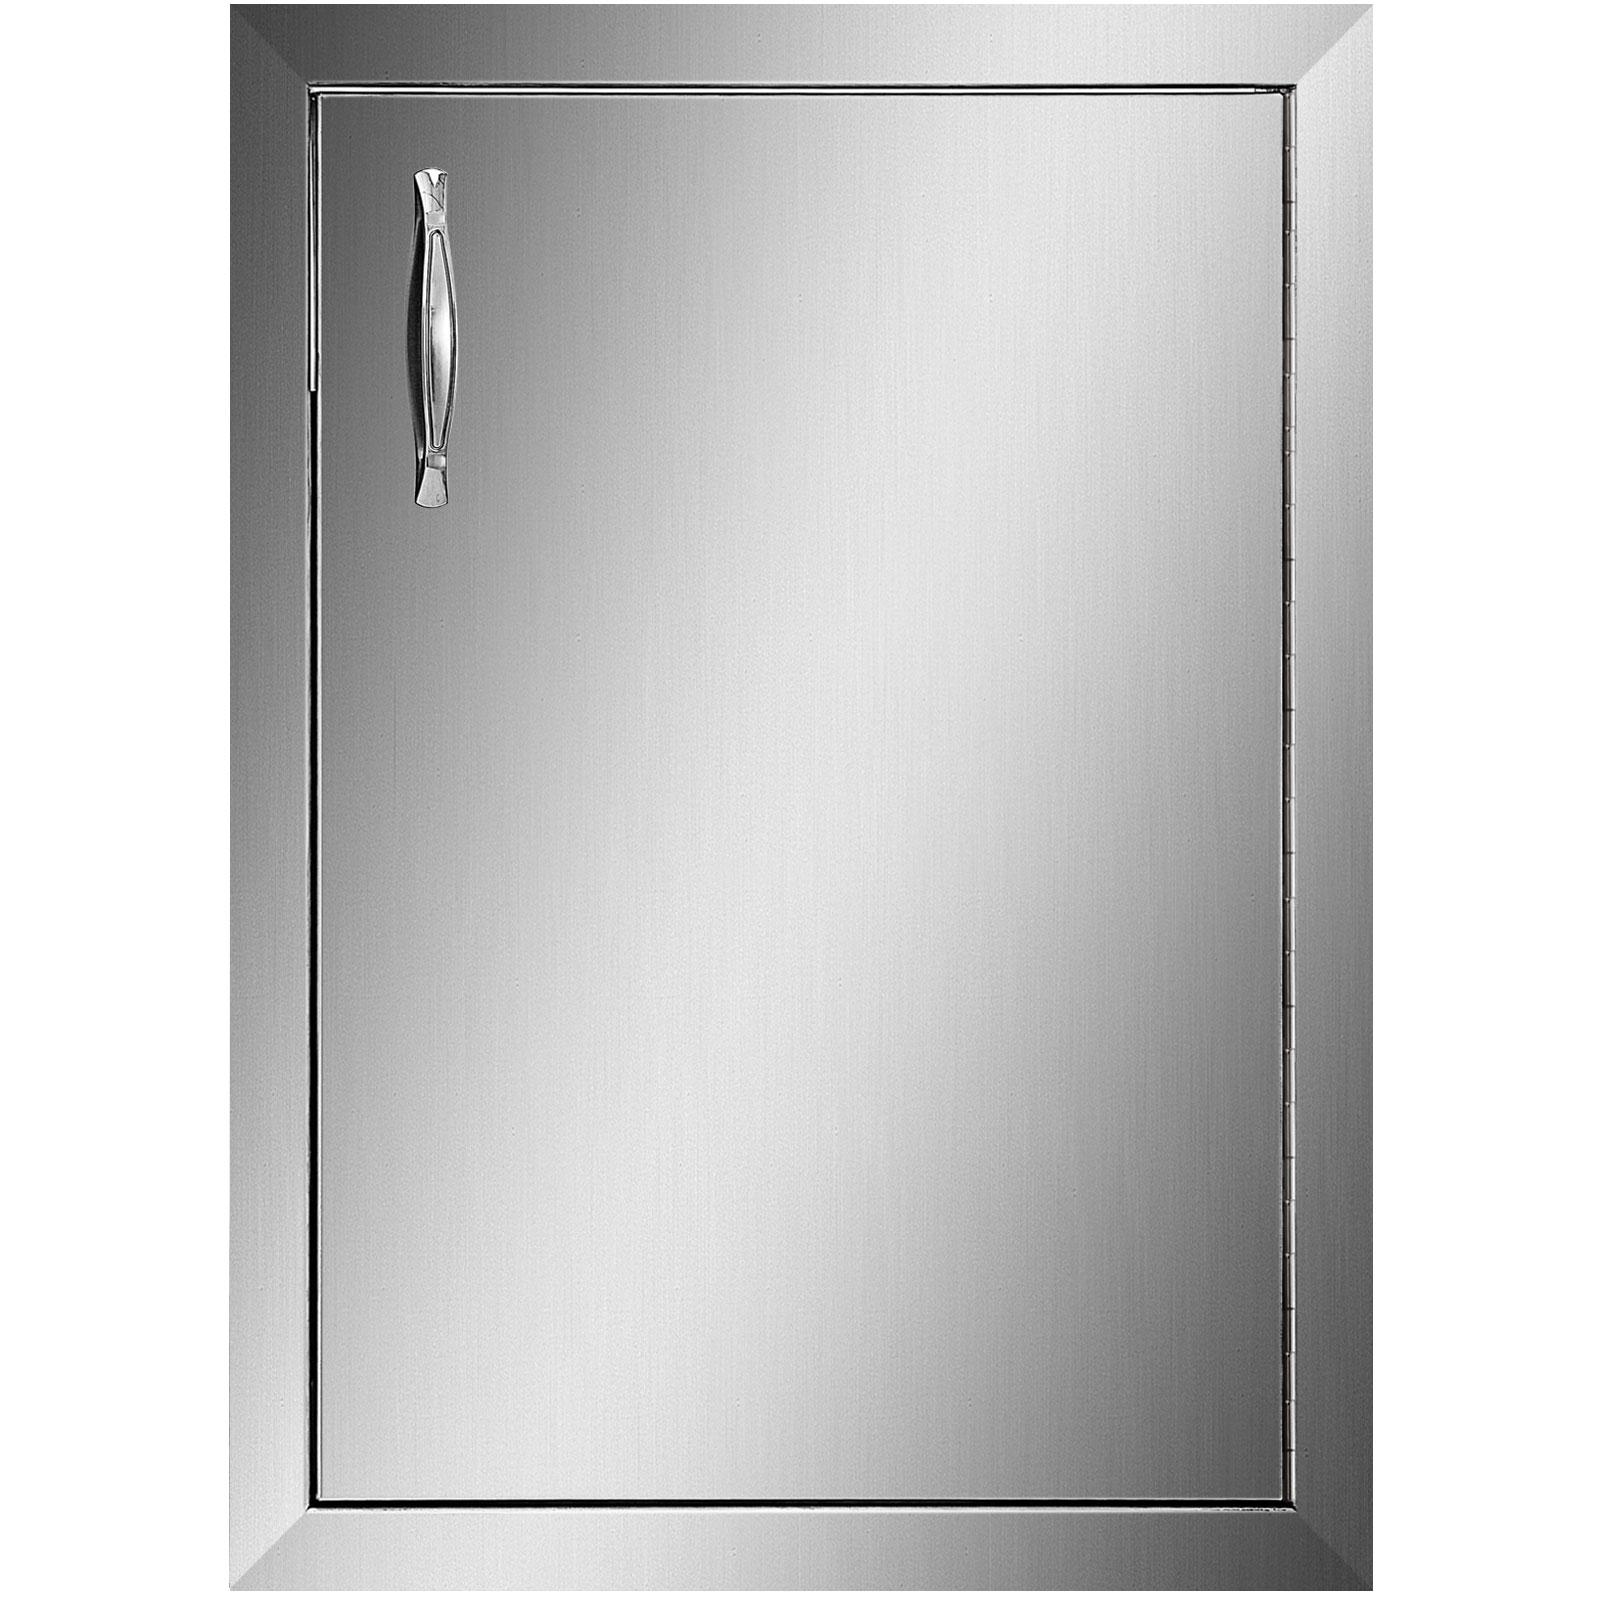 VEVOR باب واحد للشواء الوصول 16x22 بوصة يمين يسار متمحور الفولاذ المقاوم للصدأ محطة شواء في الهواء الطلق خزانة مطبخ شواء جزيرة الباب